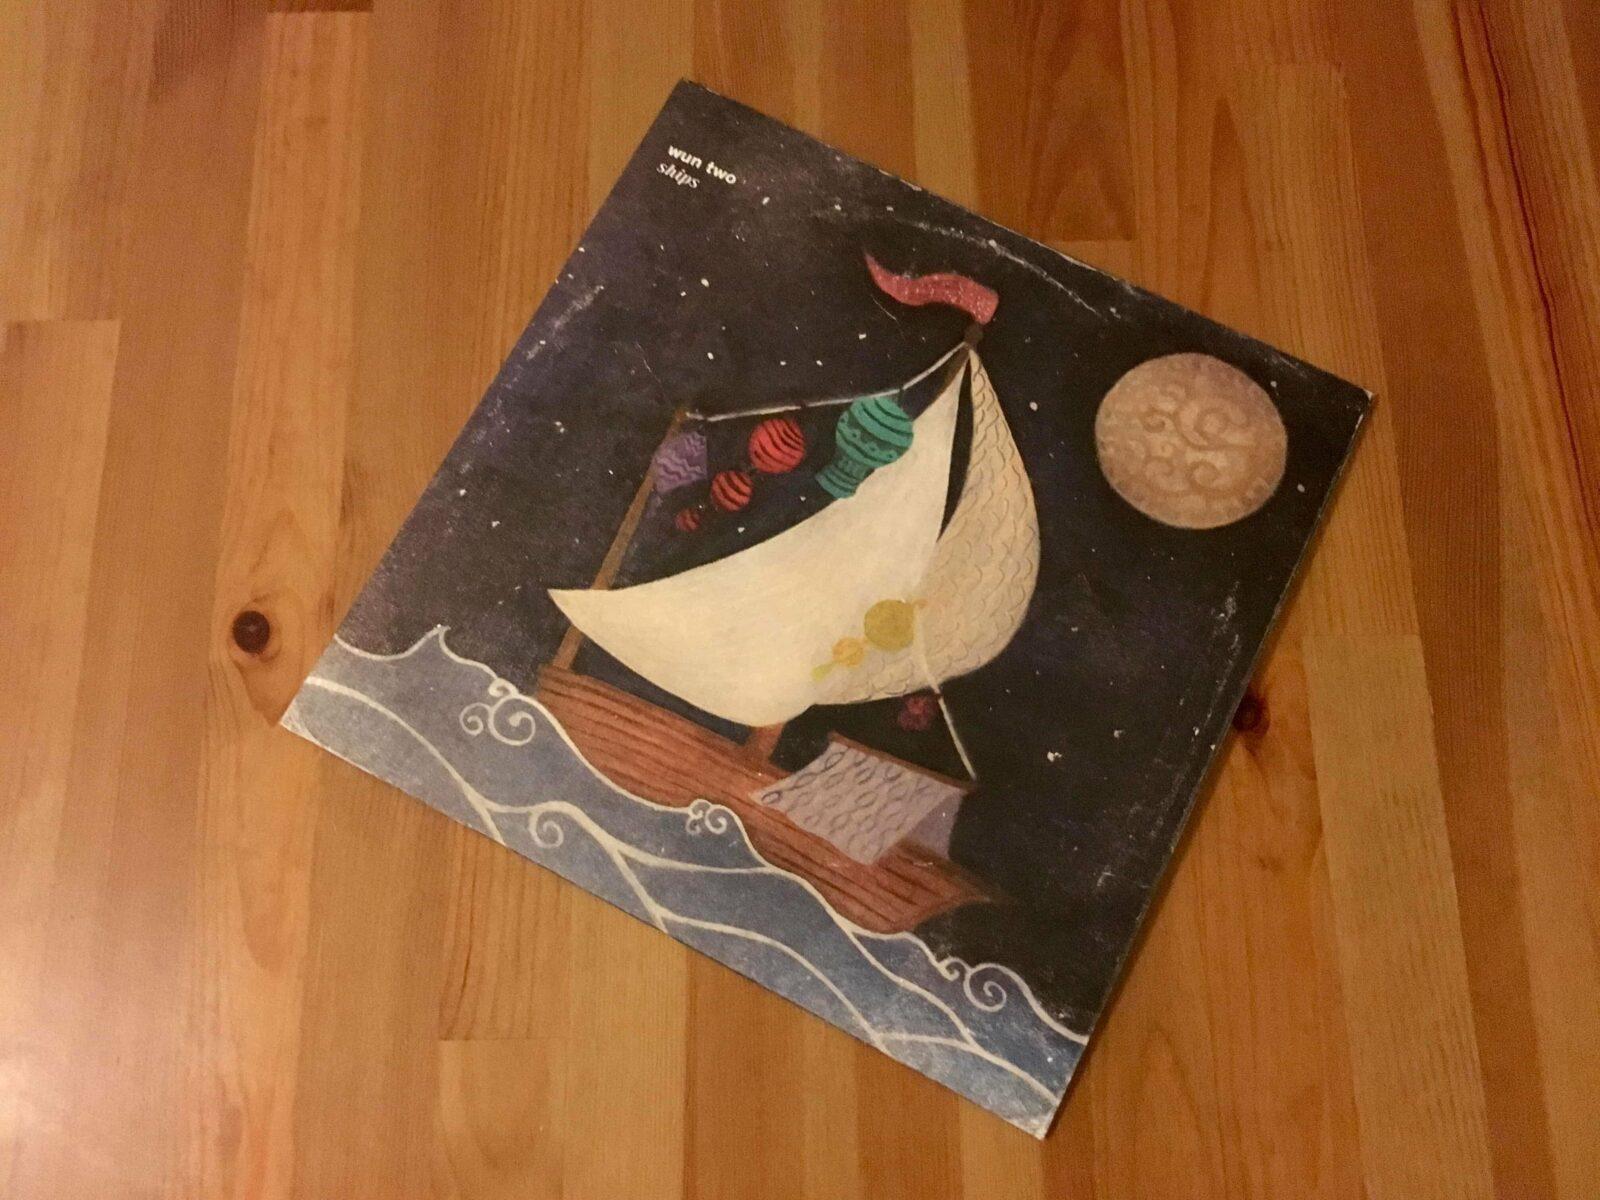 Ships White Vinyl Edition - Wun Two (2016)